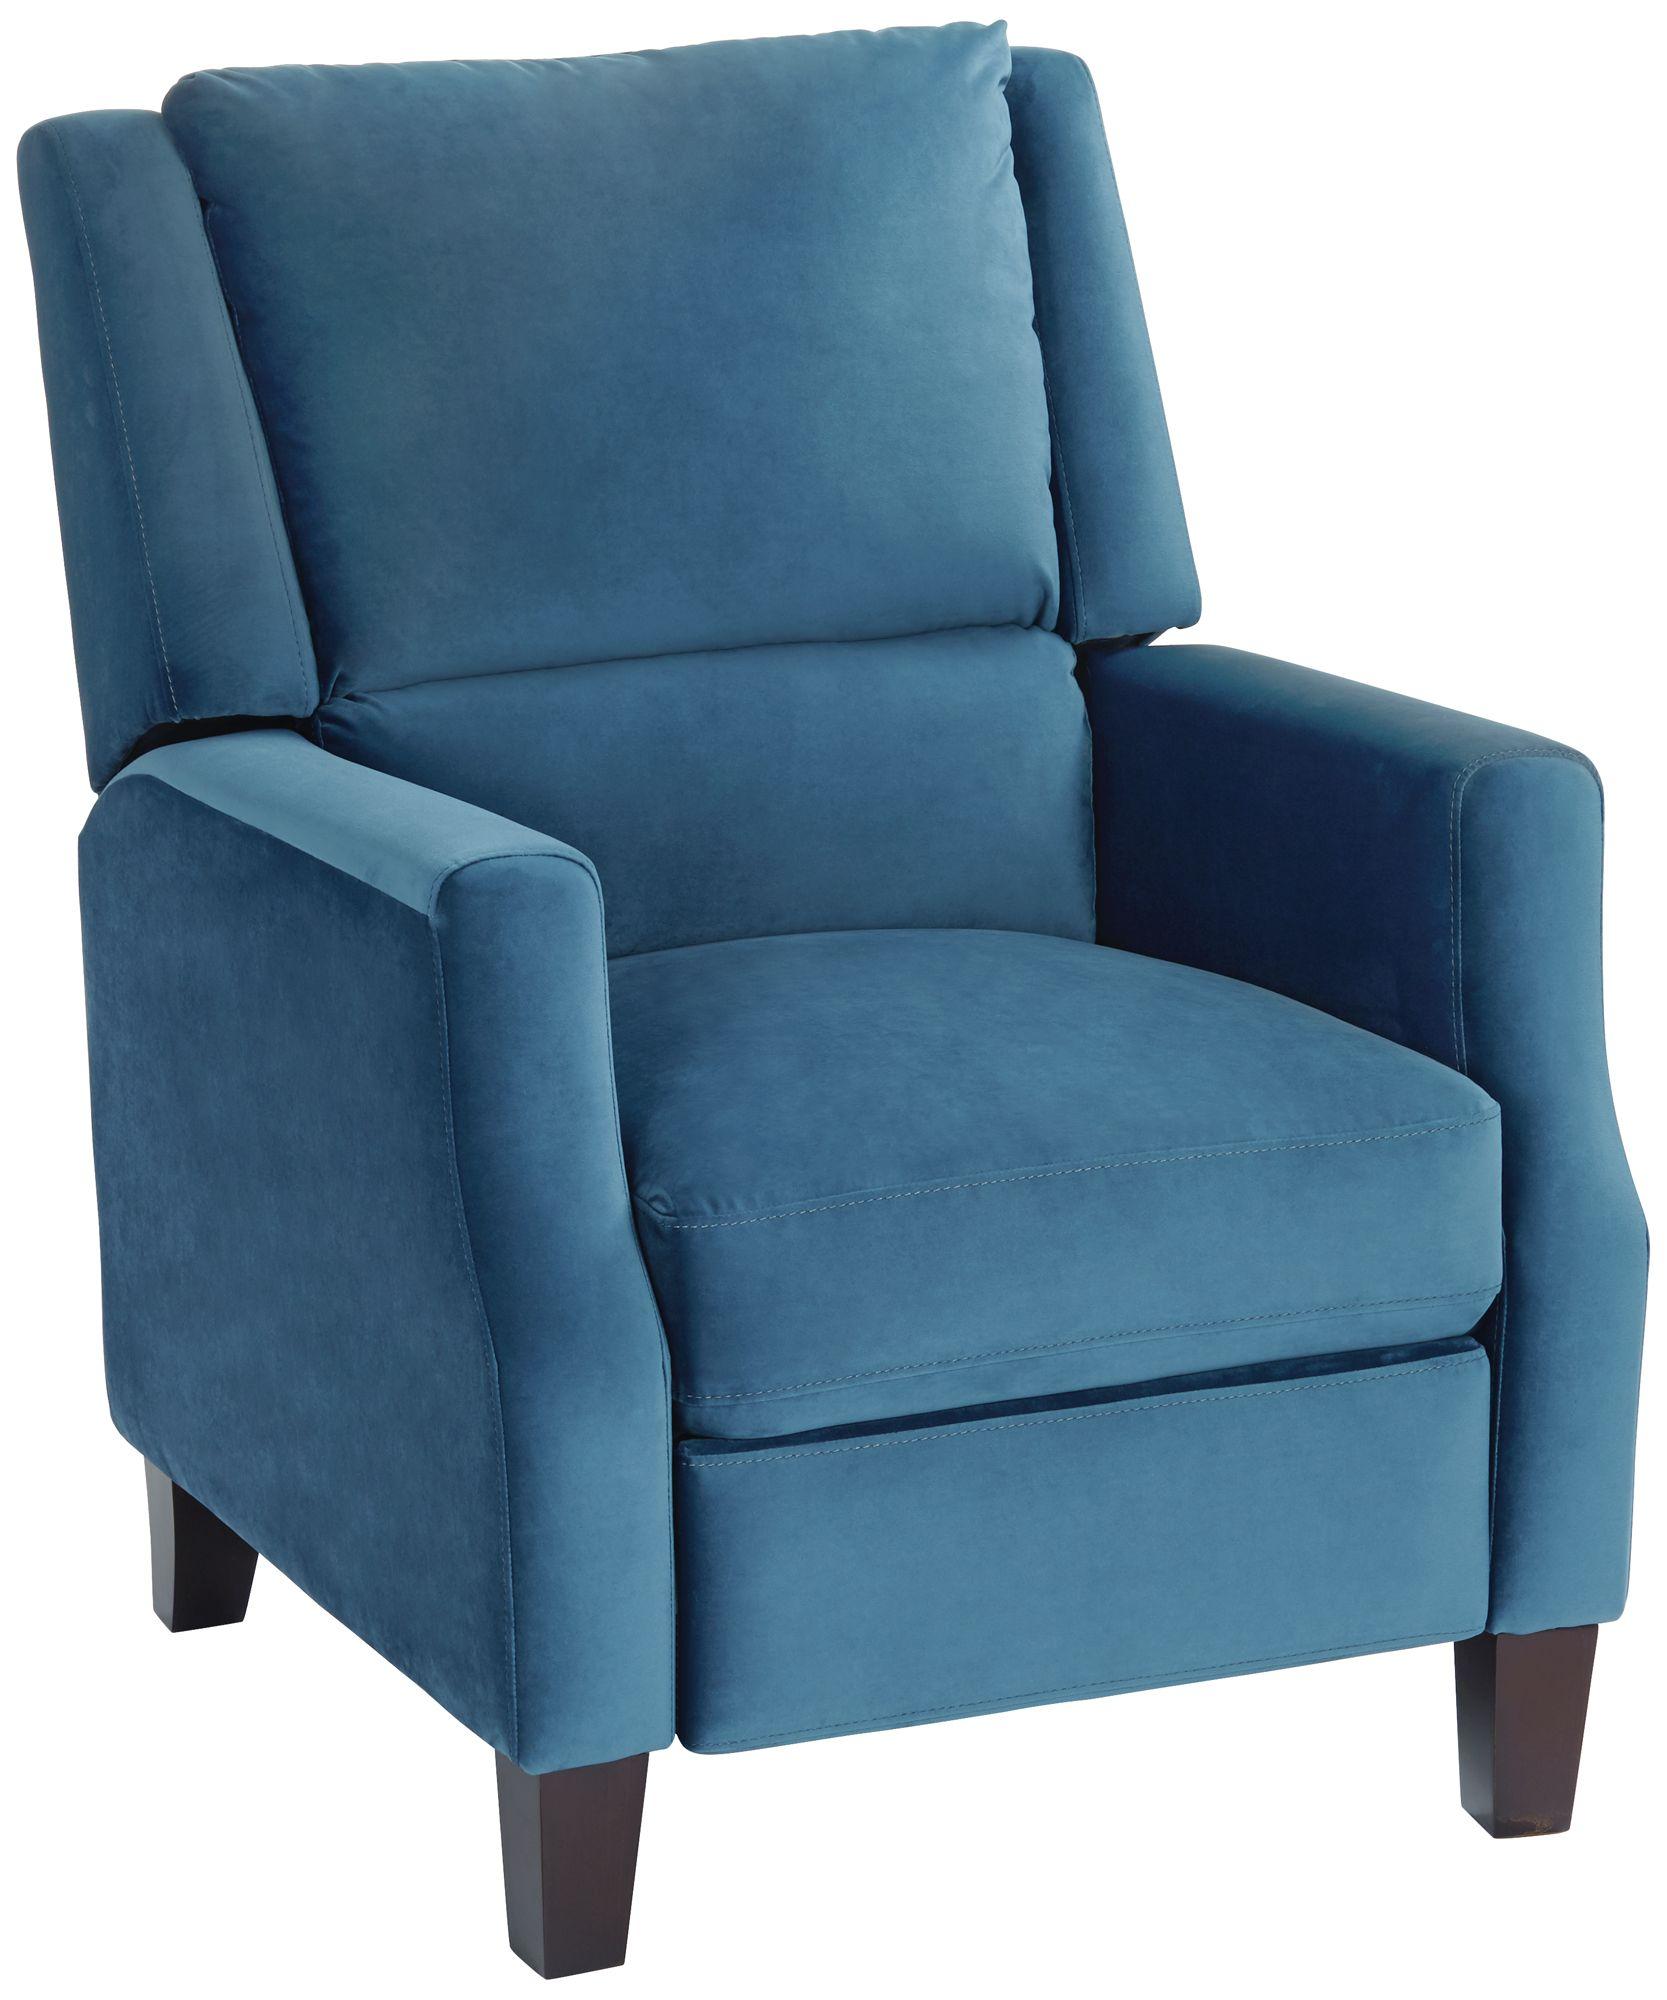 Great Irina Blue Velvet Recliner Chair